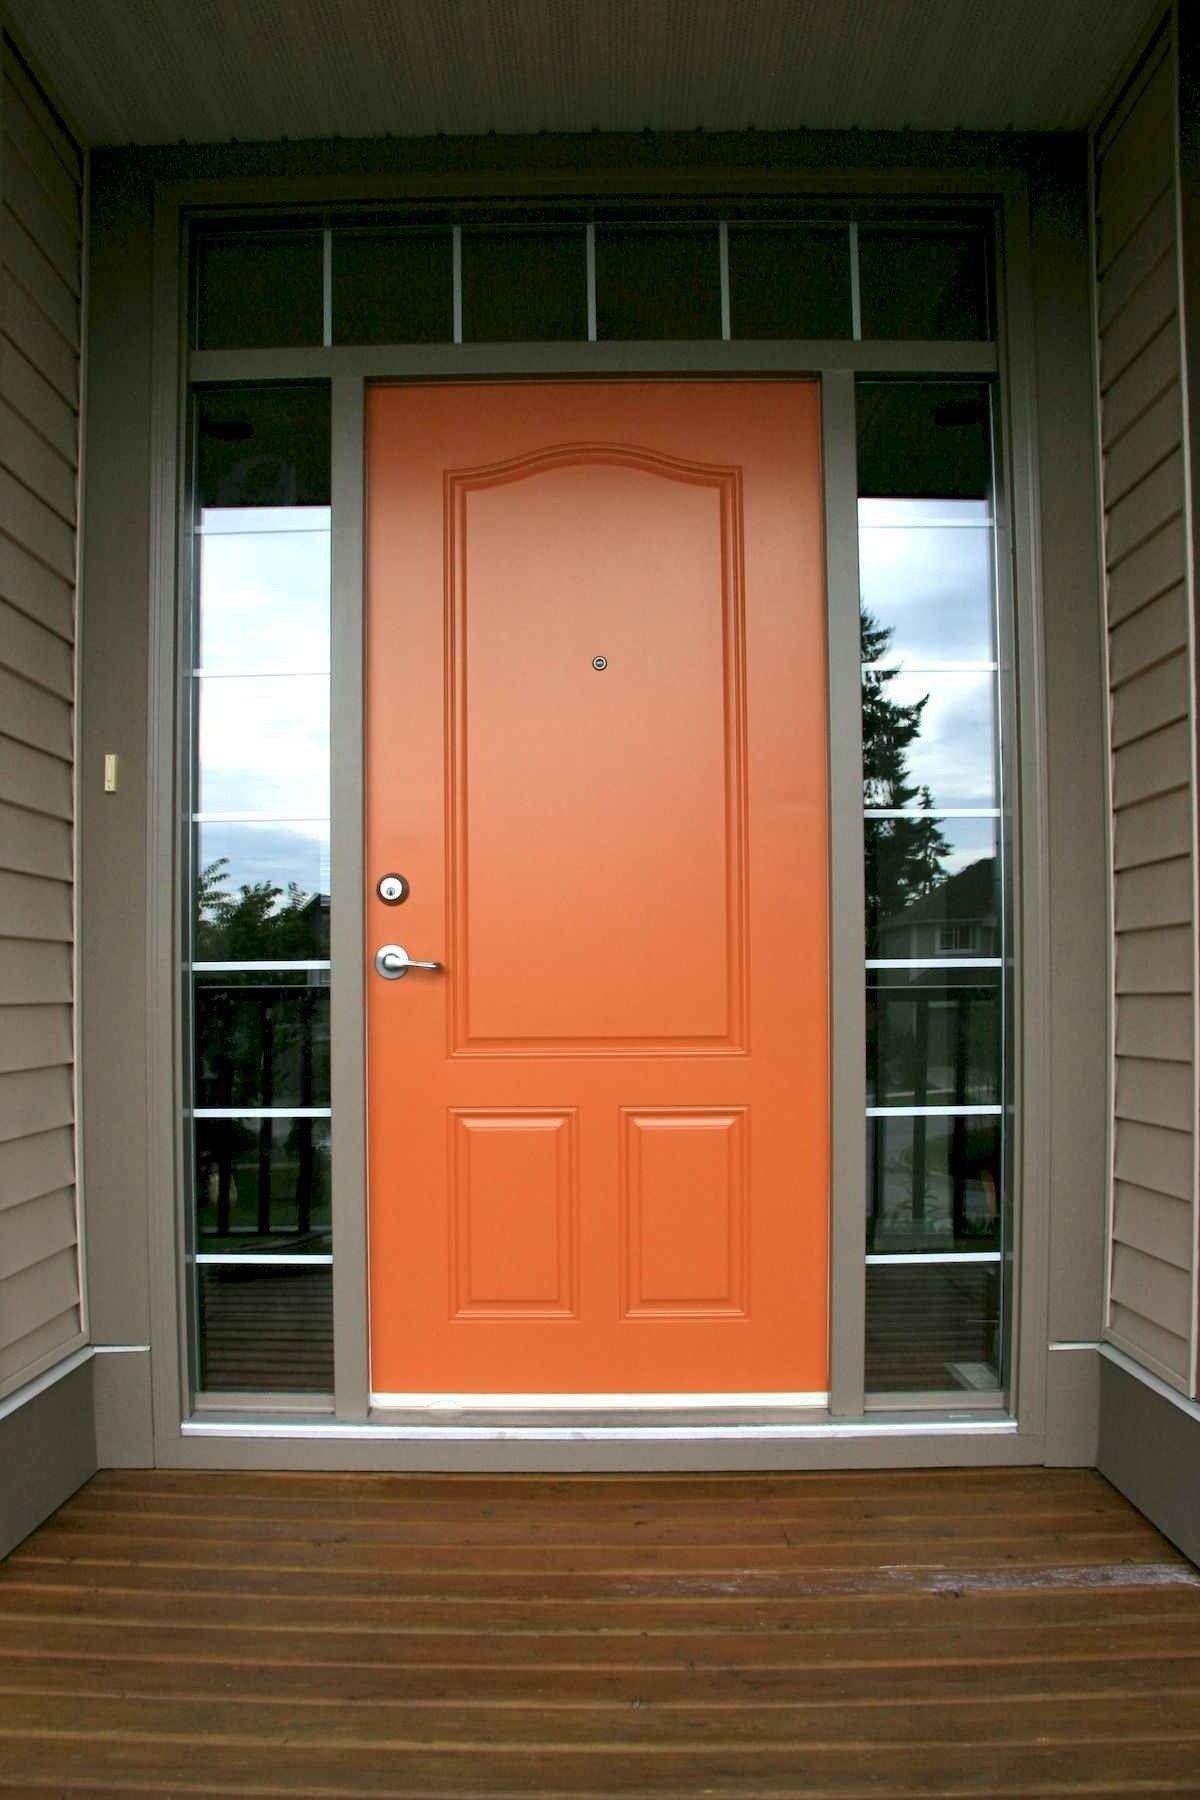 100 Unique Front Doors Colors Design Ideas 14 Orange Front Doors Unique Front Doors Front Door Paint Colors